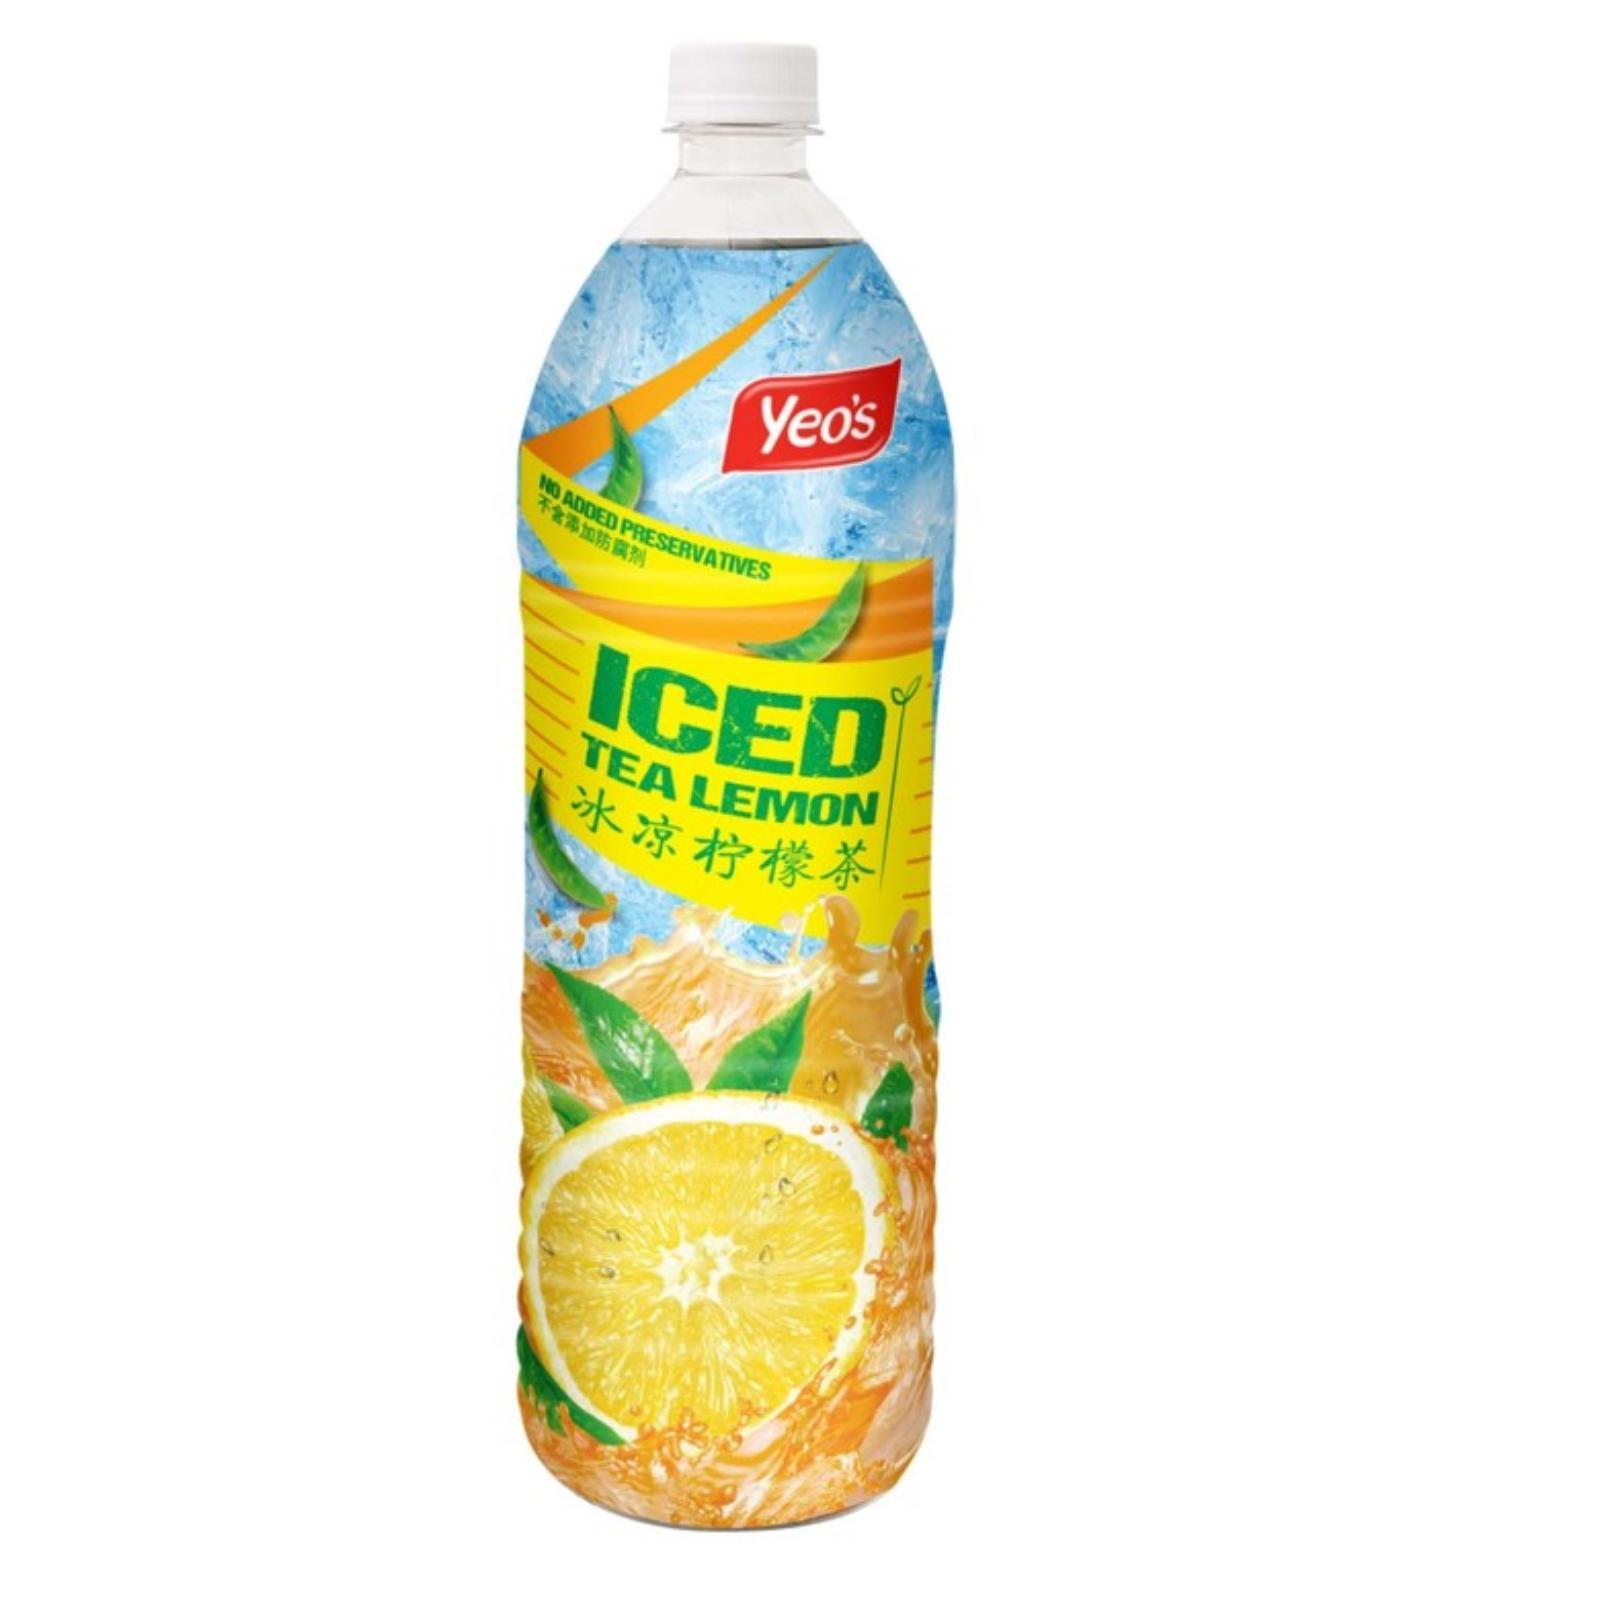 Yeo's Drink - Iced Lemon Tea